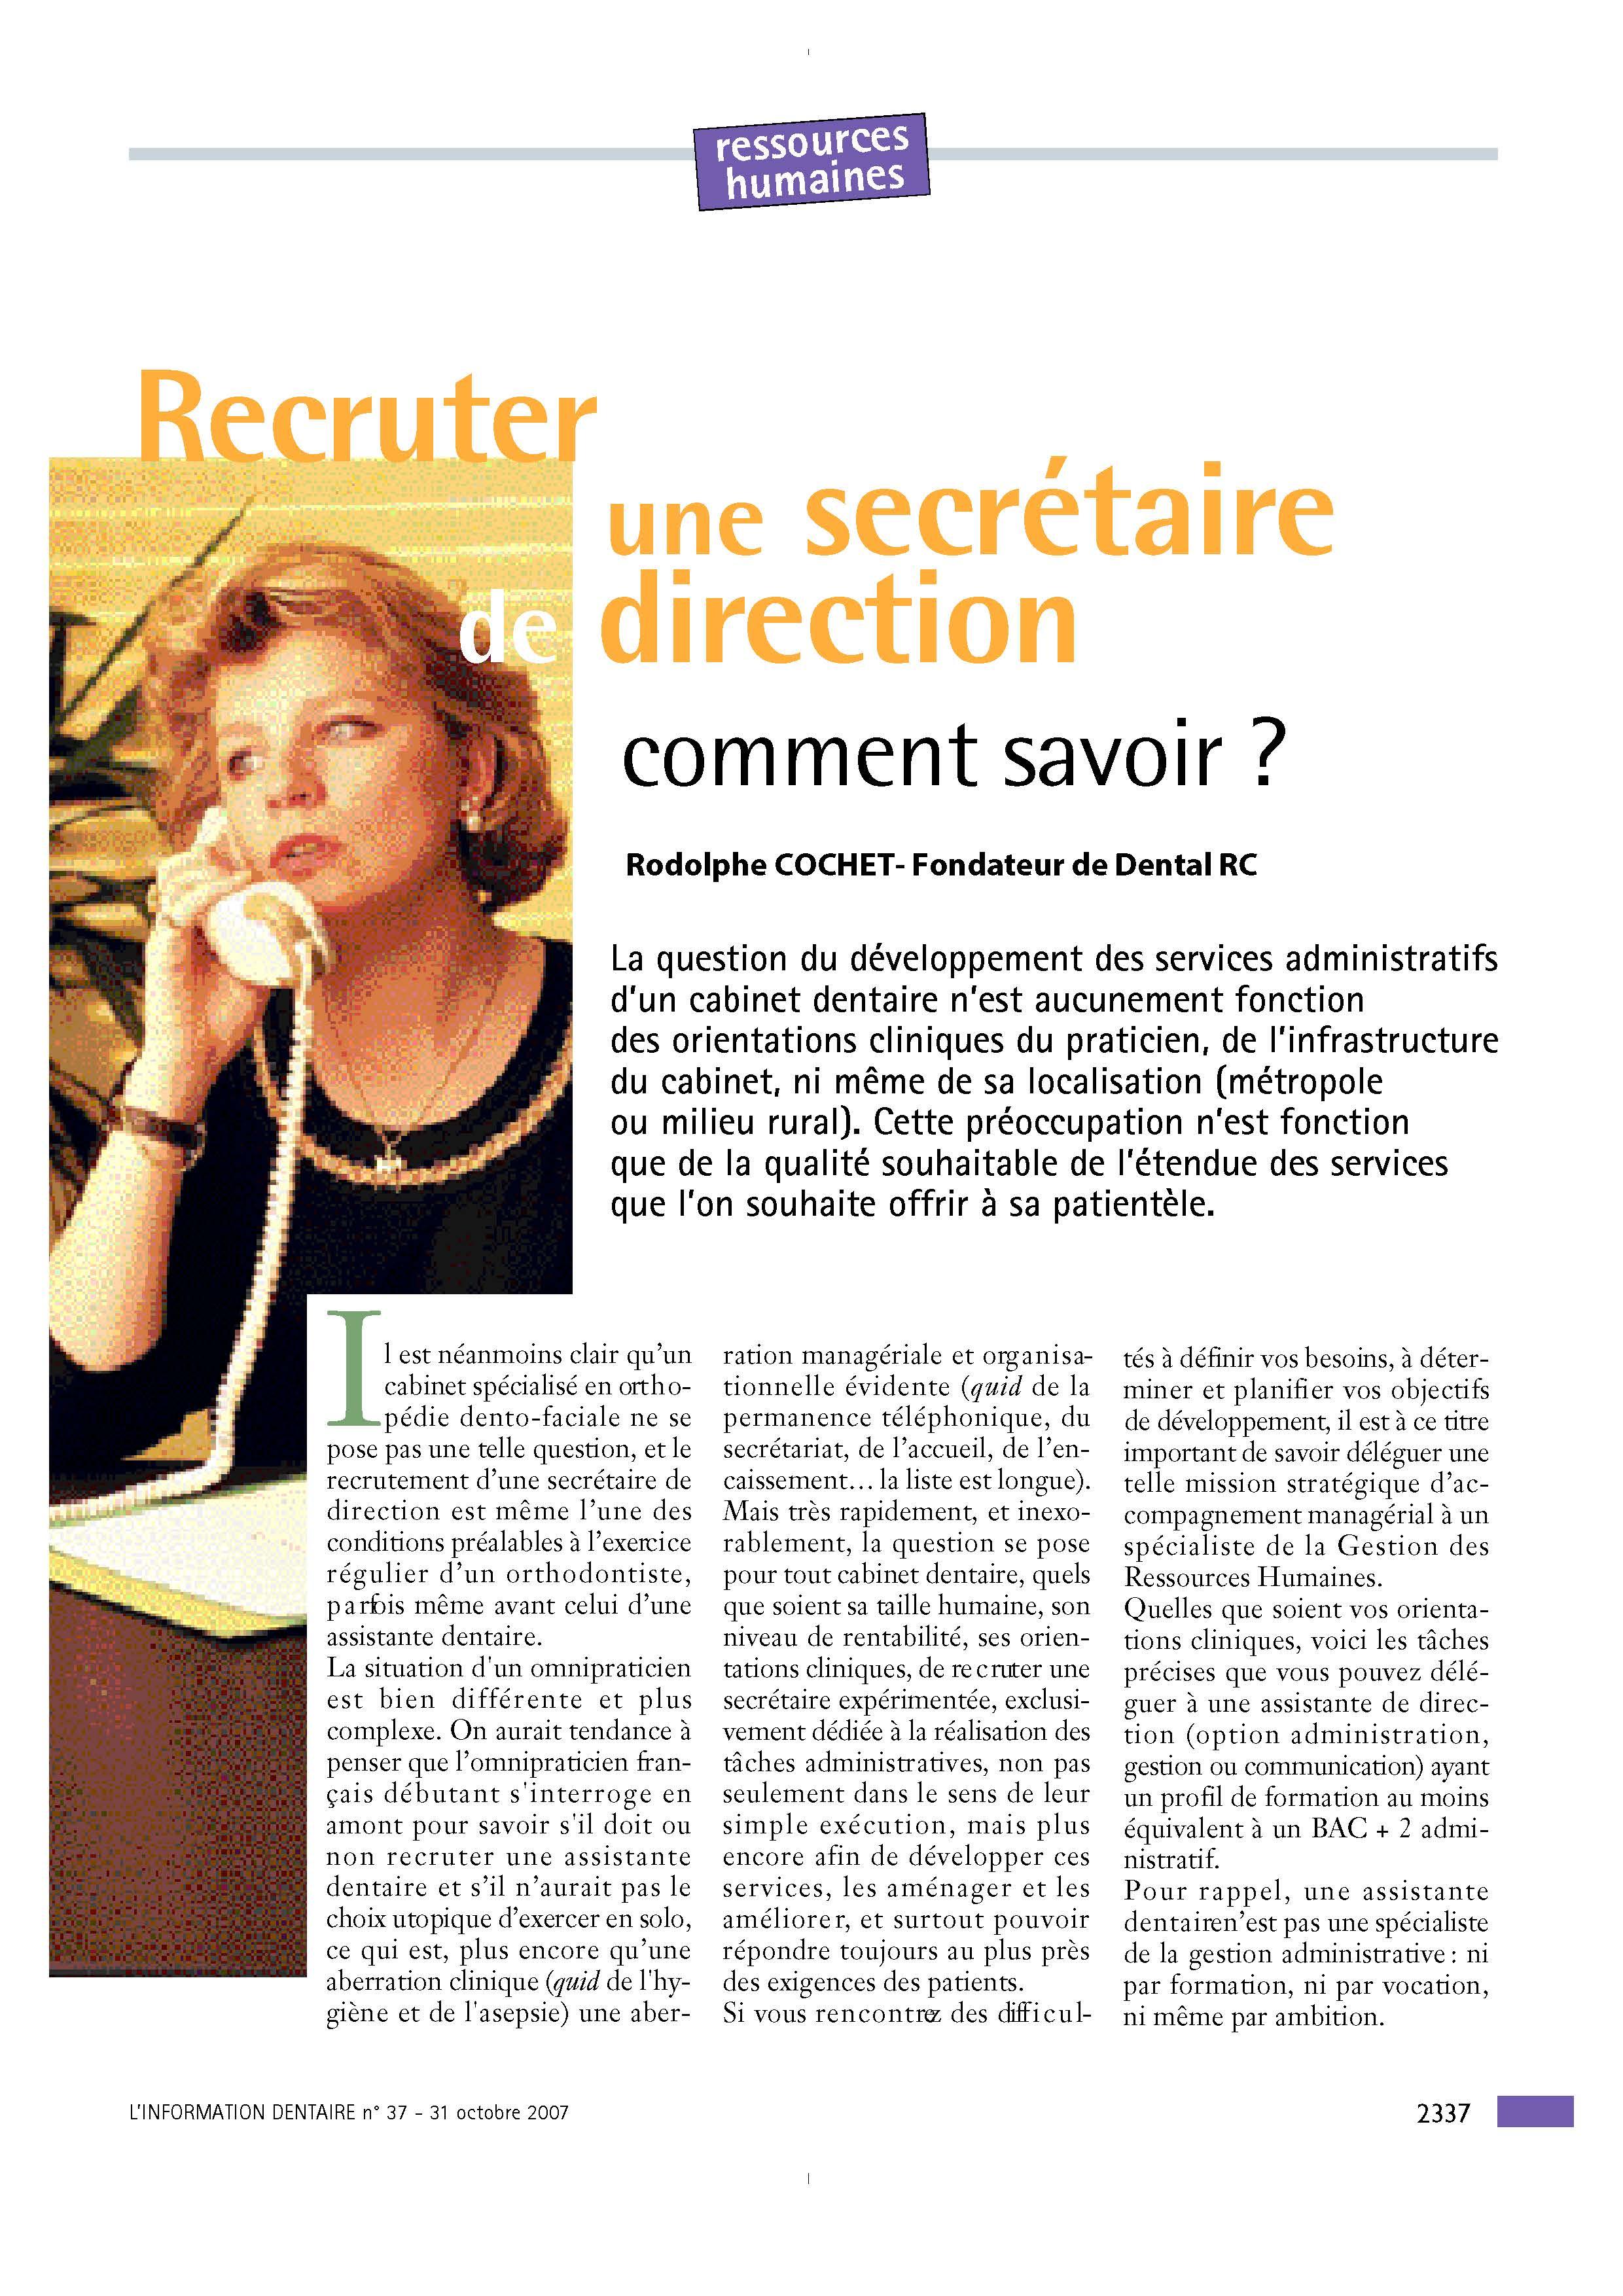 Information_Dentaire_-_Recruter_une_assistante_de_Direction_en_cabinet_dentaire_-_Rodolphe_Page_1_Page_1.jpg